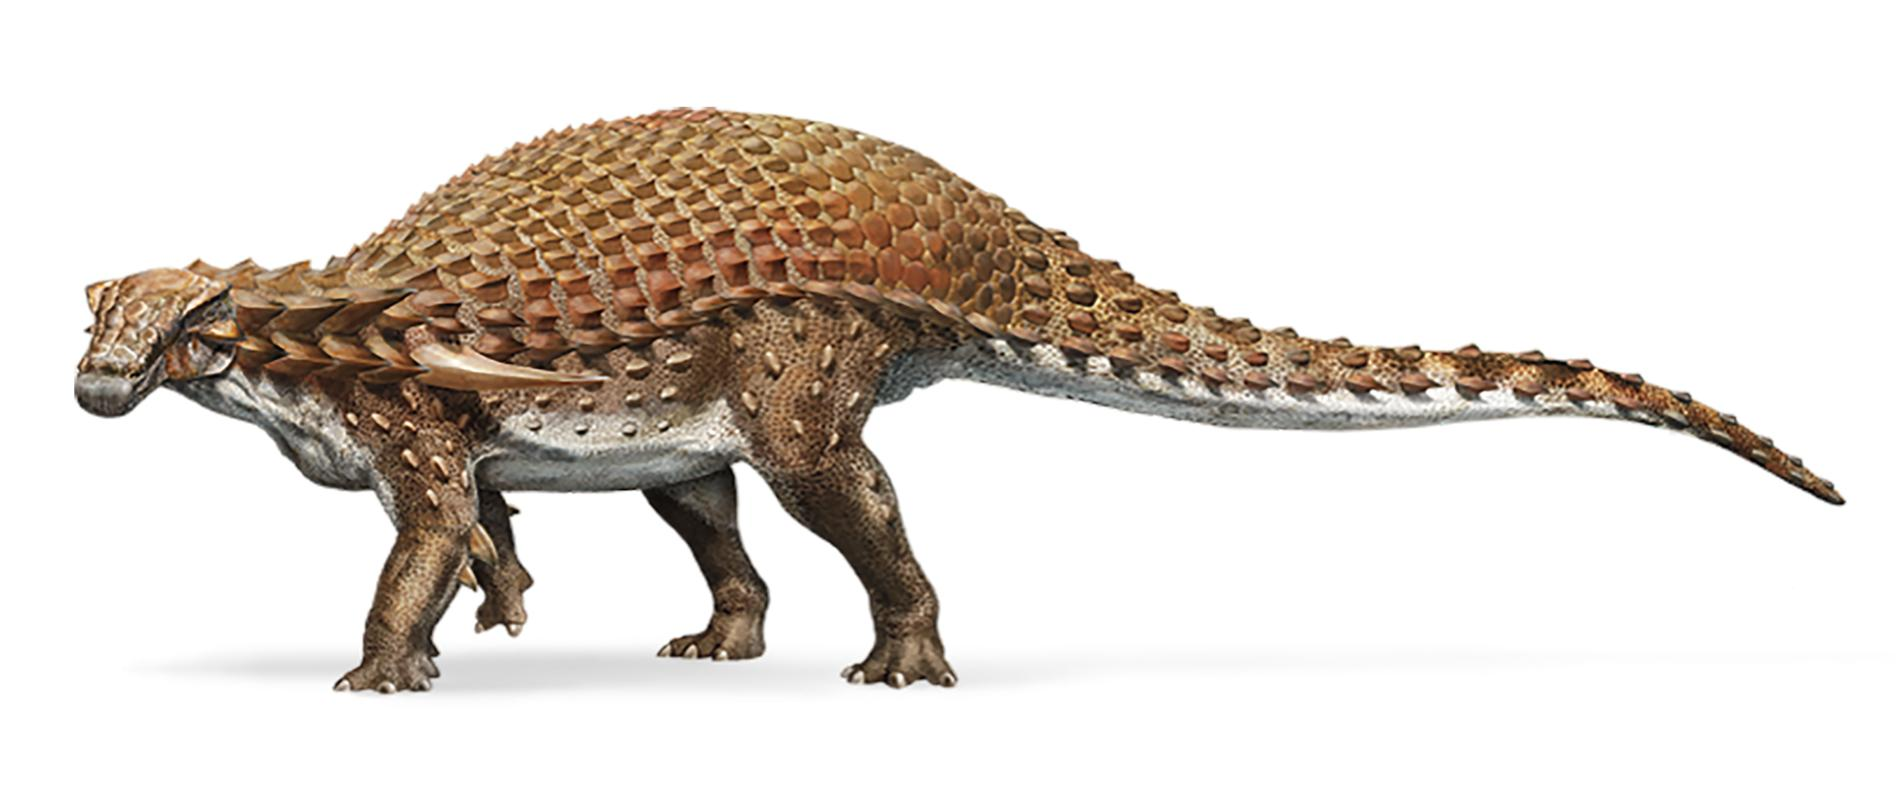 Nodosaur_silo_FLAT_3_IPAD.adapt.1900.1.jpg